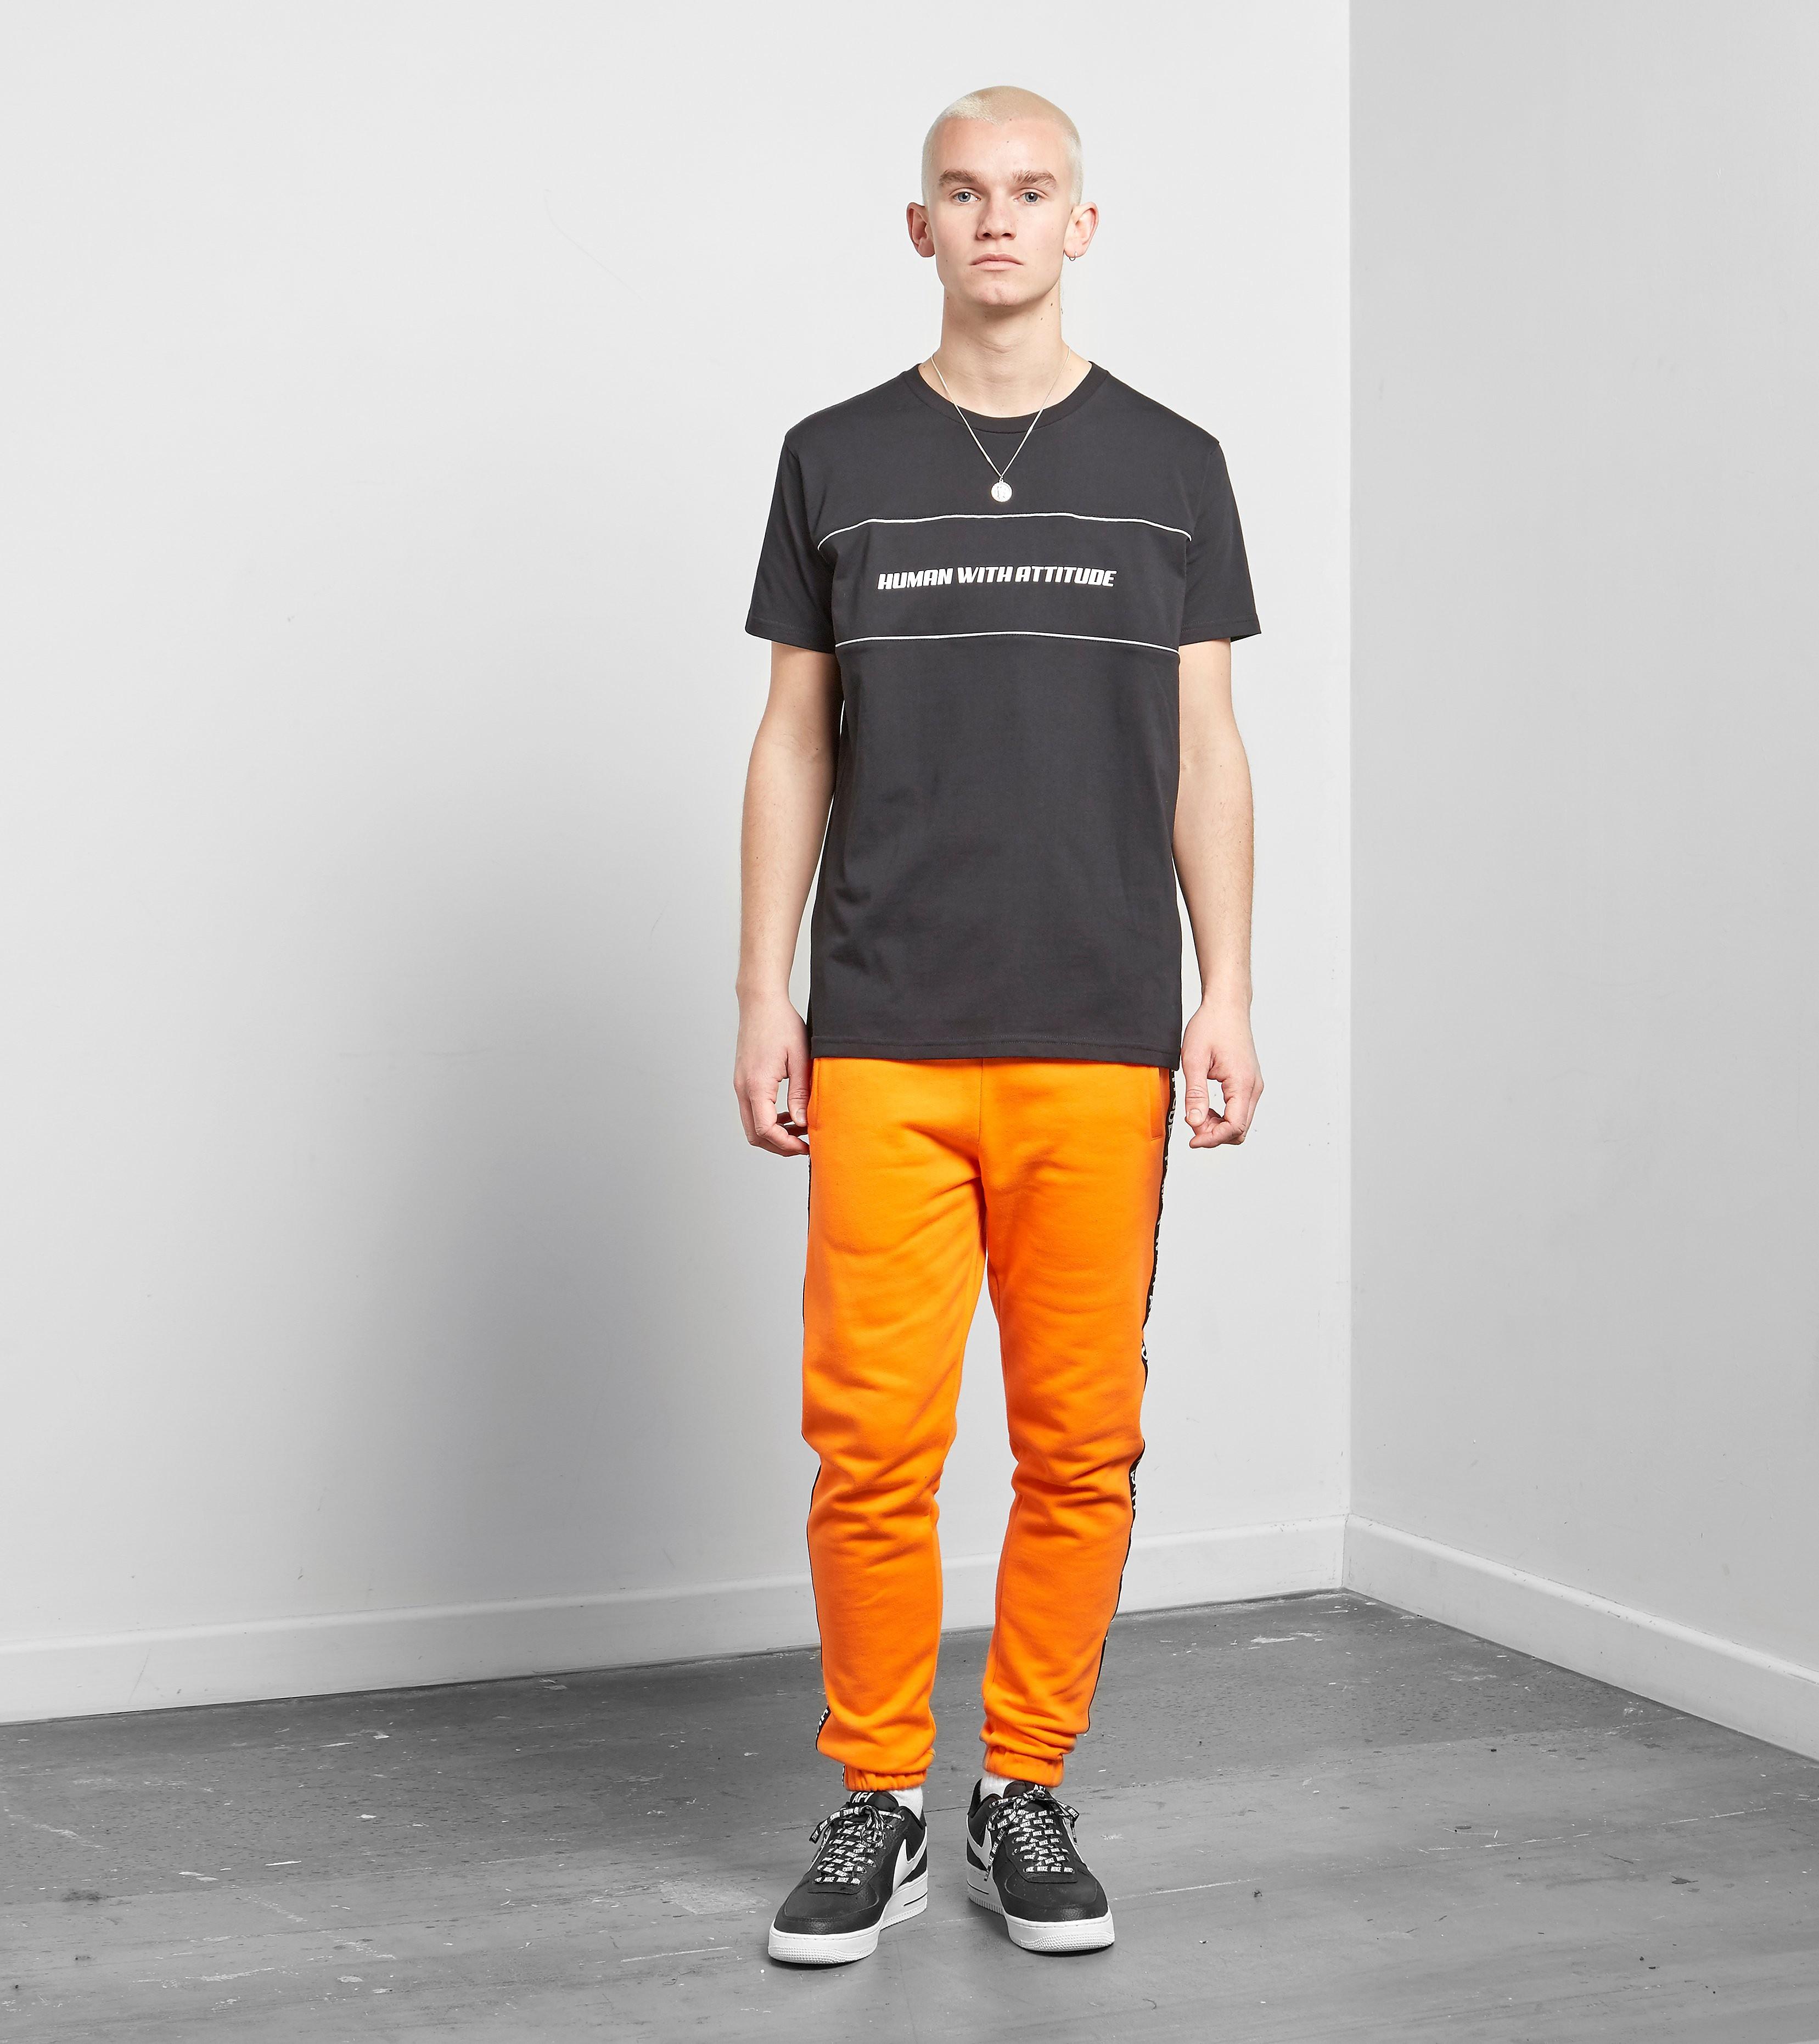 Human With Attitude Reflexion T-Shirt